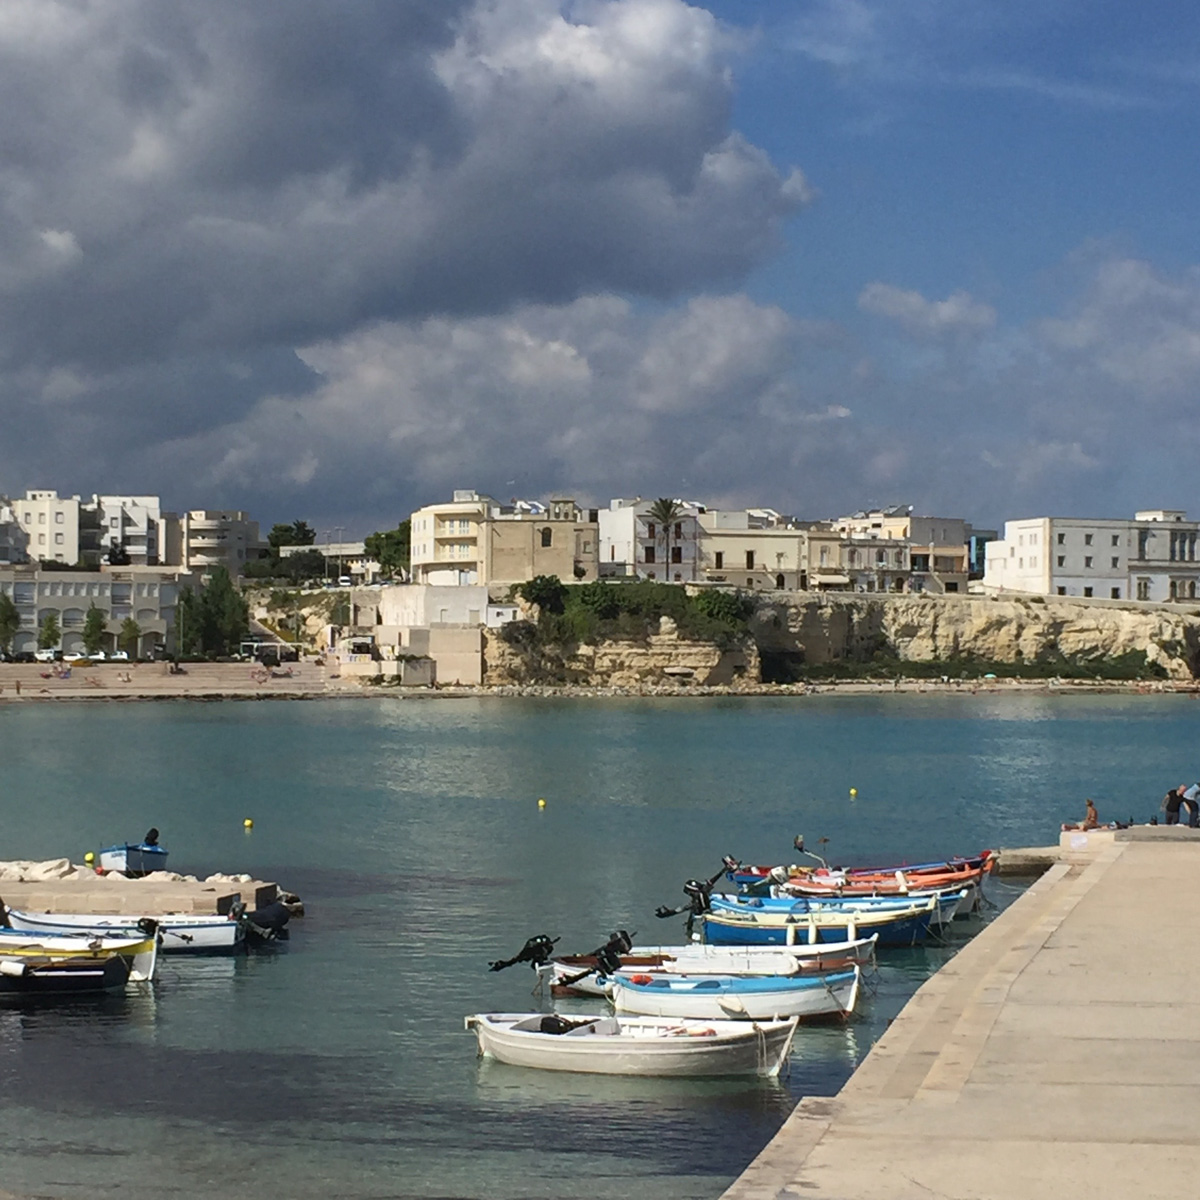 The Seaside Town of Otranto in the Salento